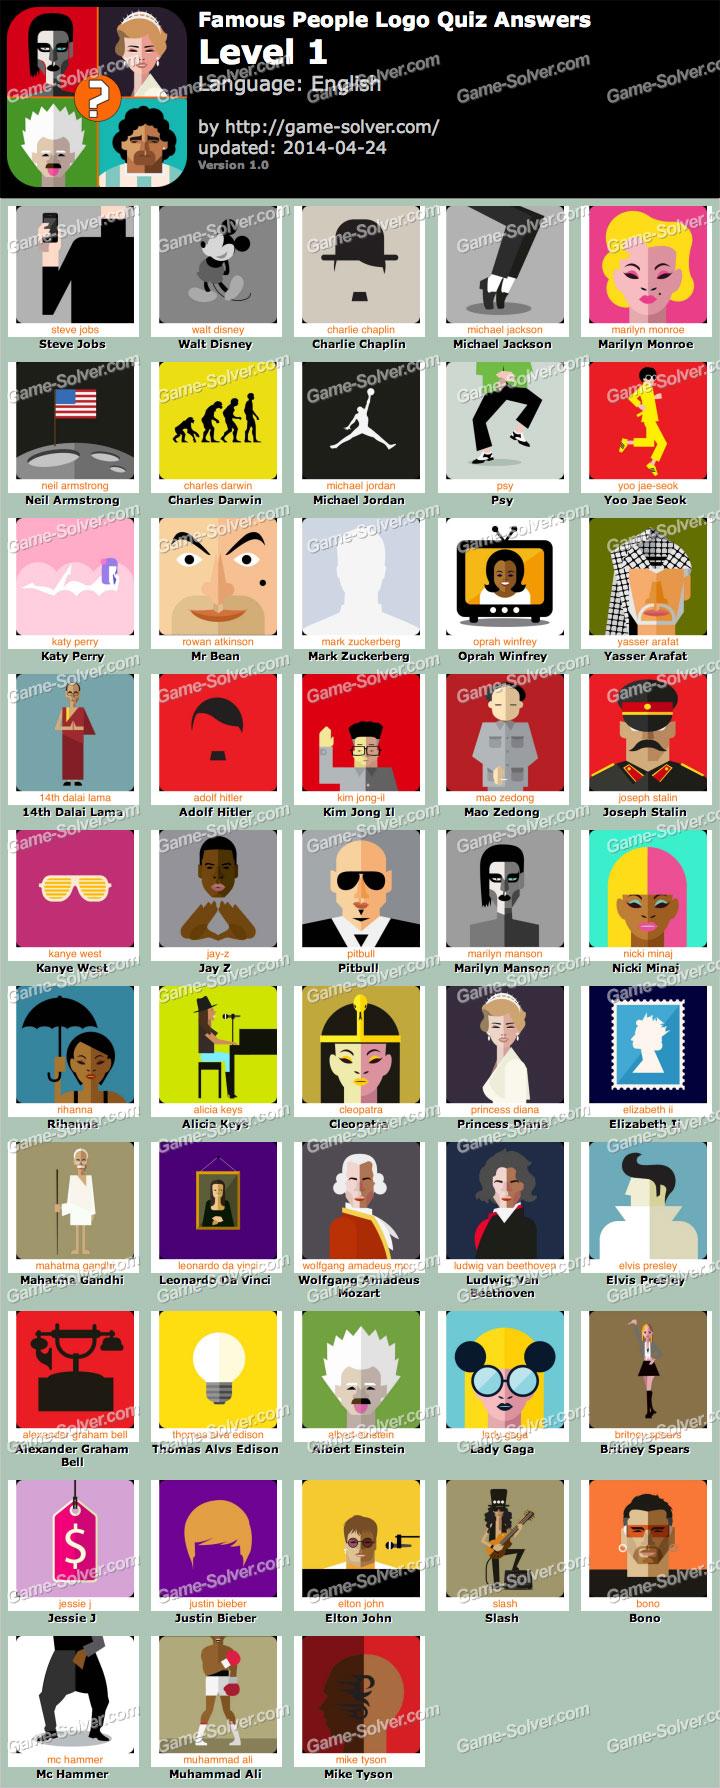 Famous People Logo Quiz Level 1